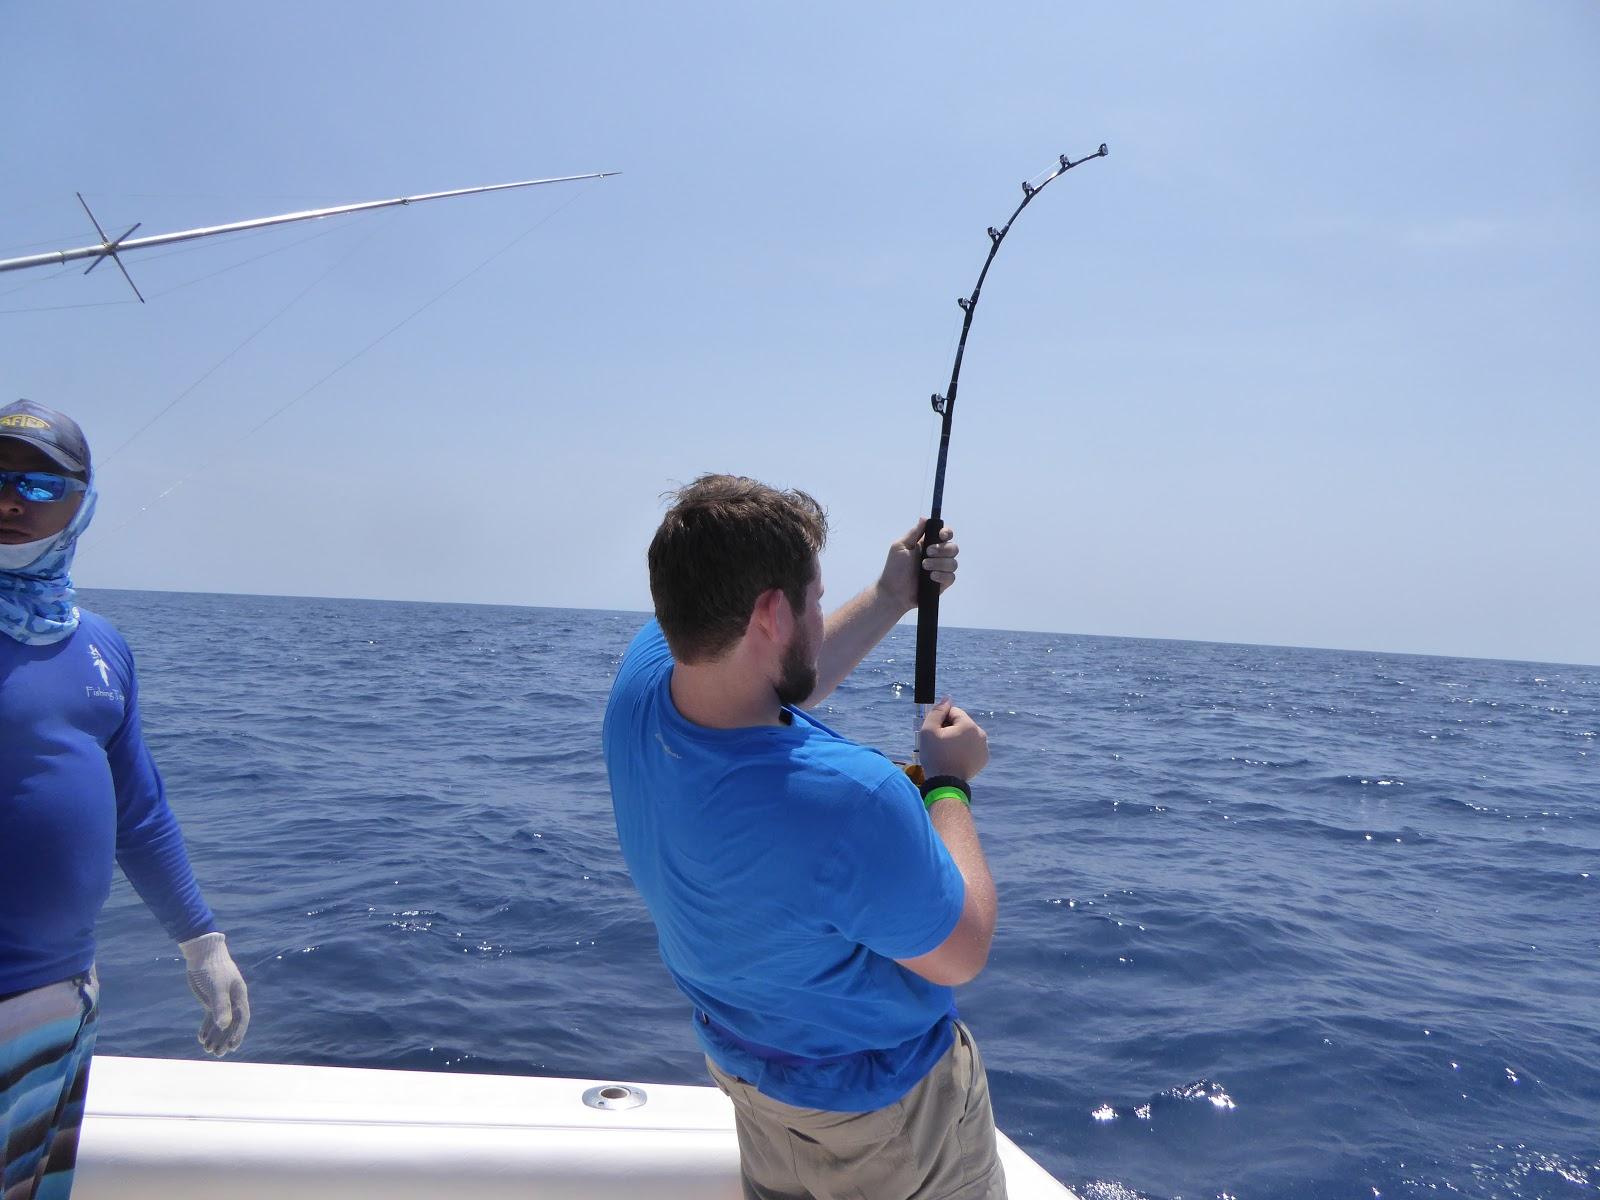 Mad marlin lodge sailfish marlin fishing charters for Sport fishing games